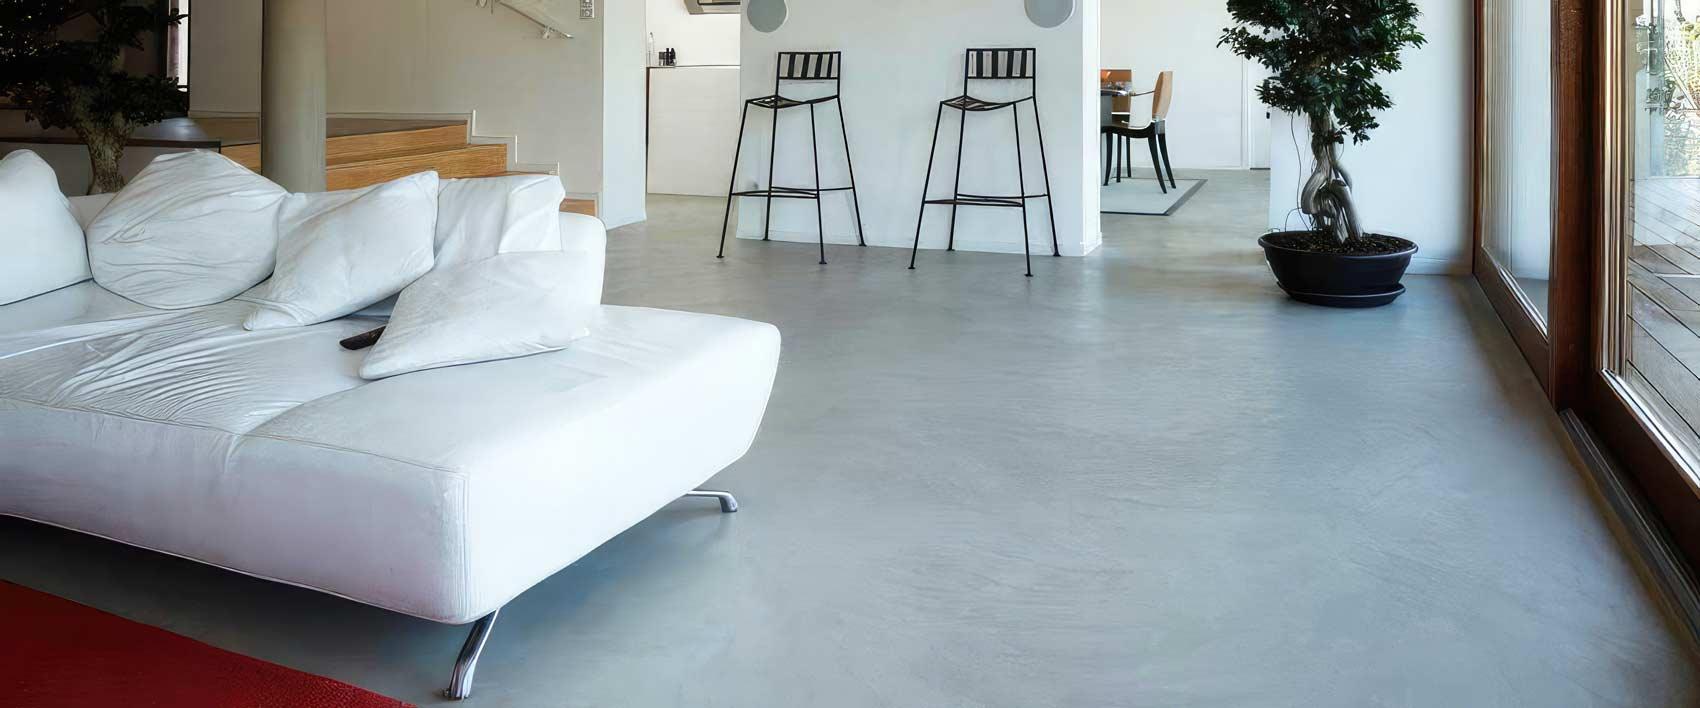 Tadelakt moderno prodotto innovativo per pavimenti e arredi